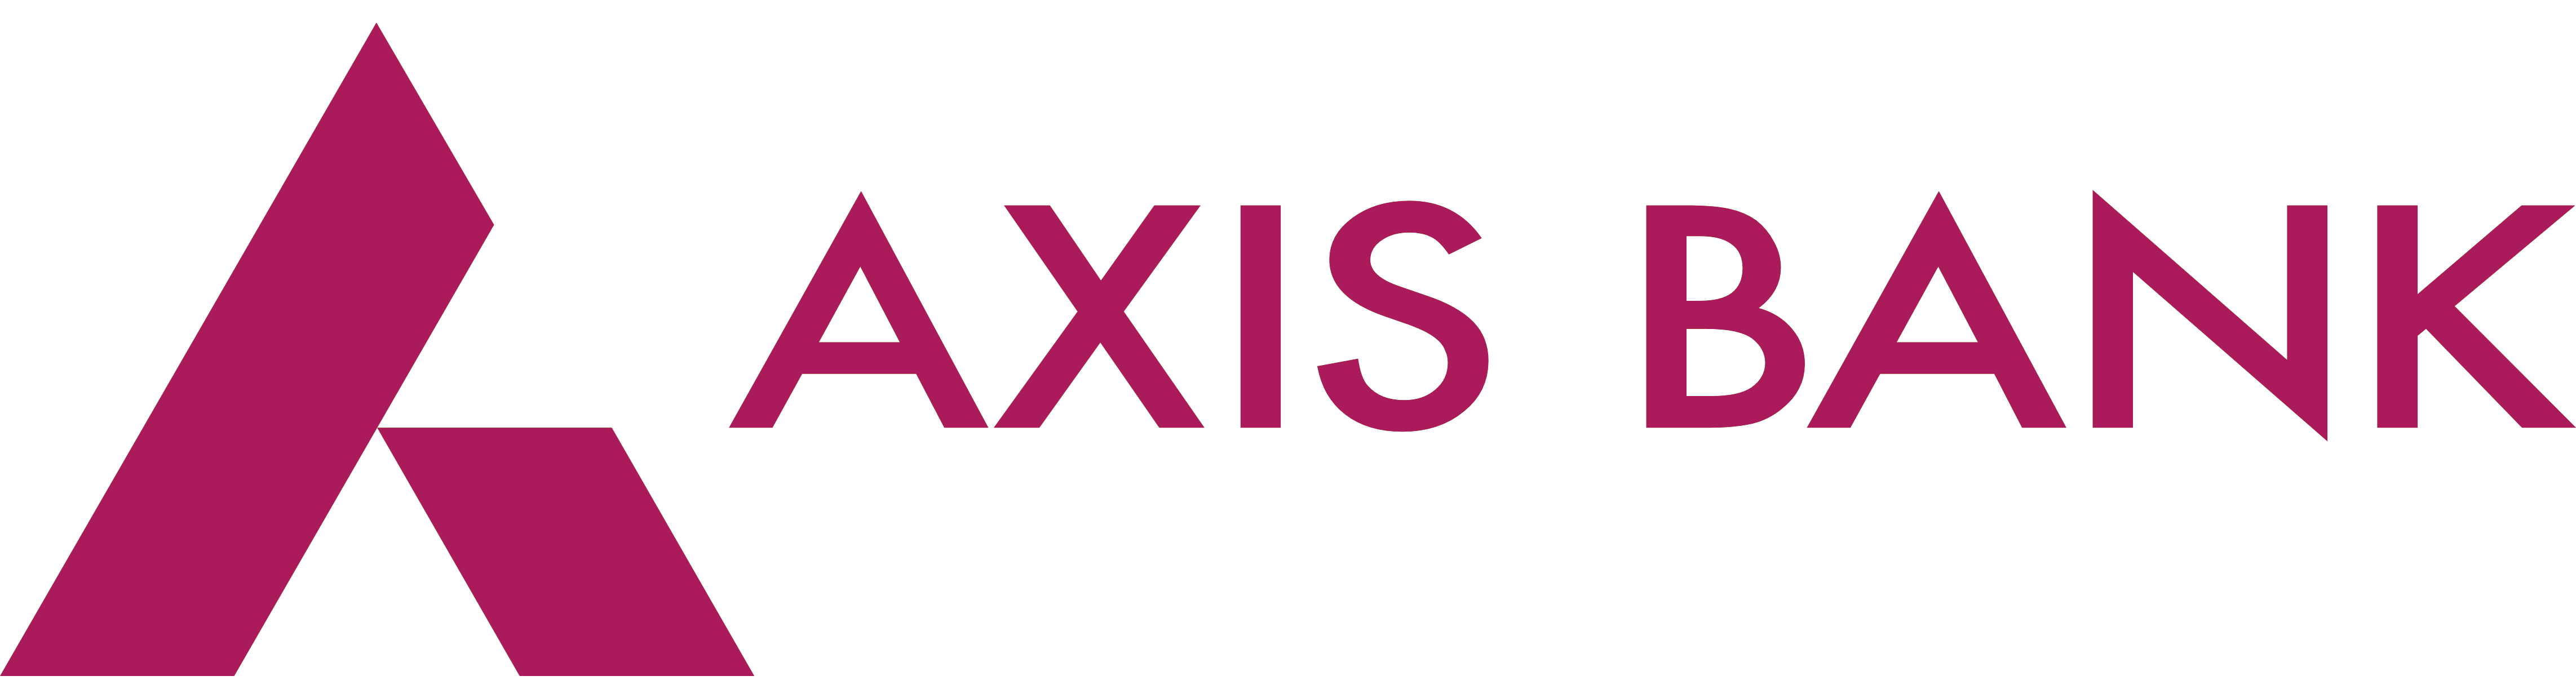 Axis Bank.